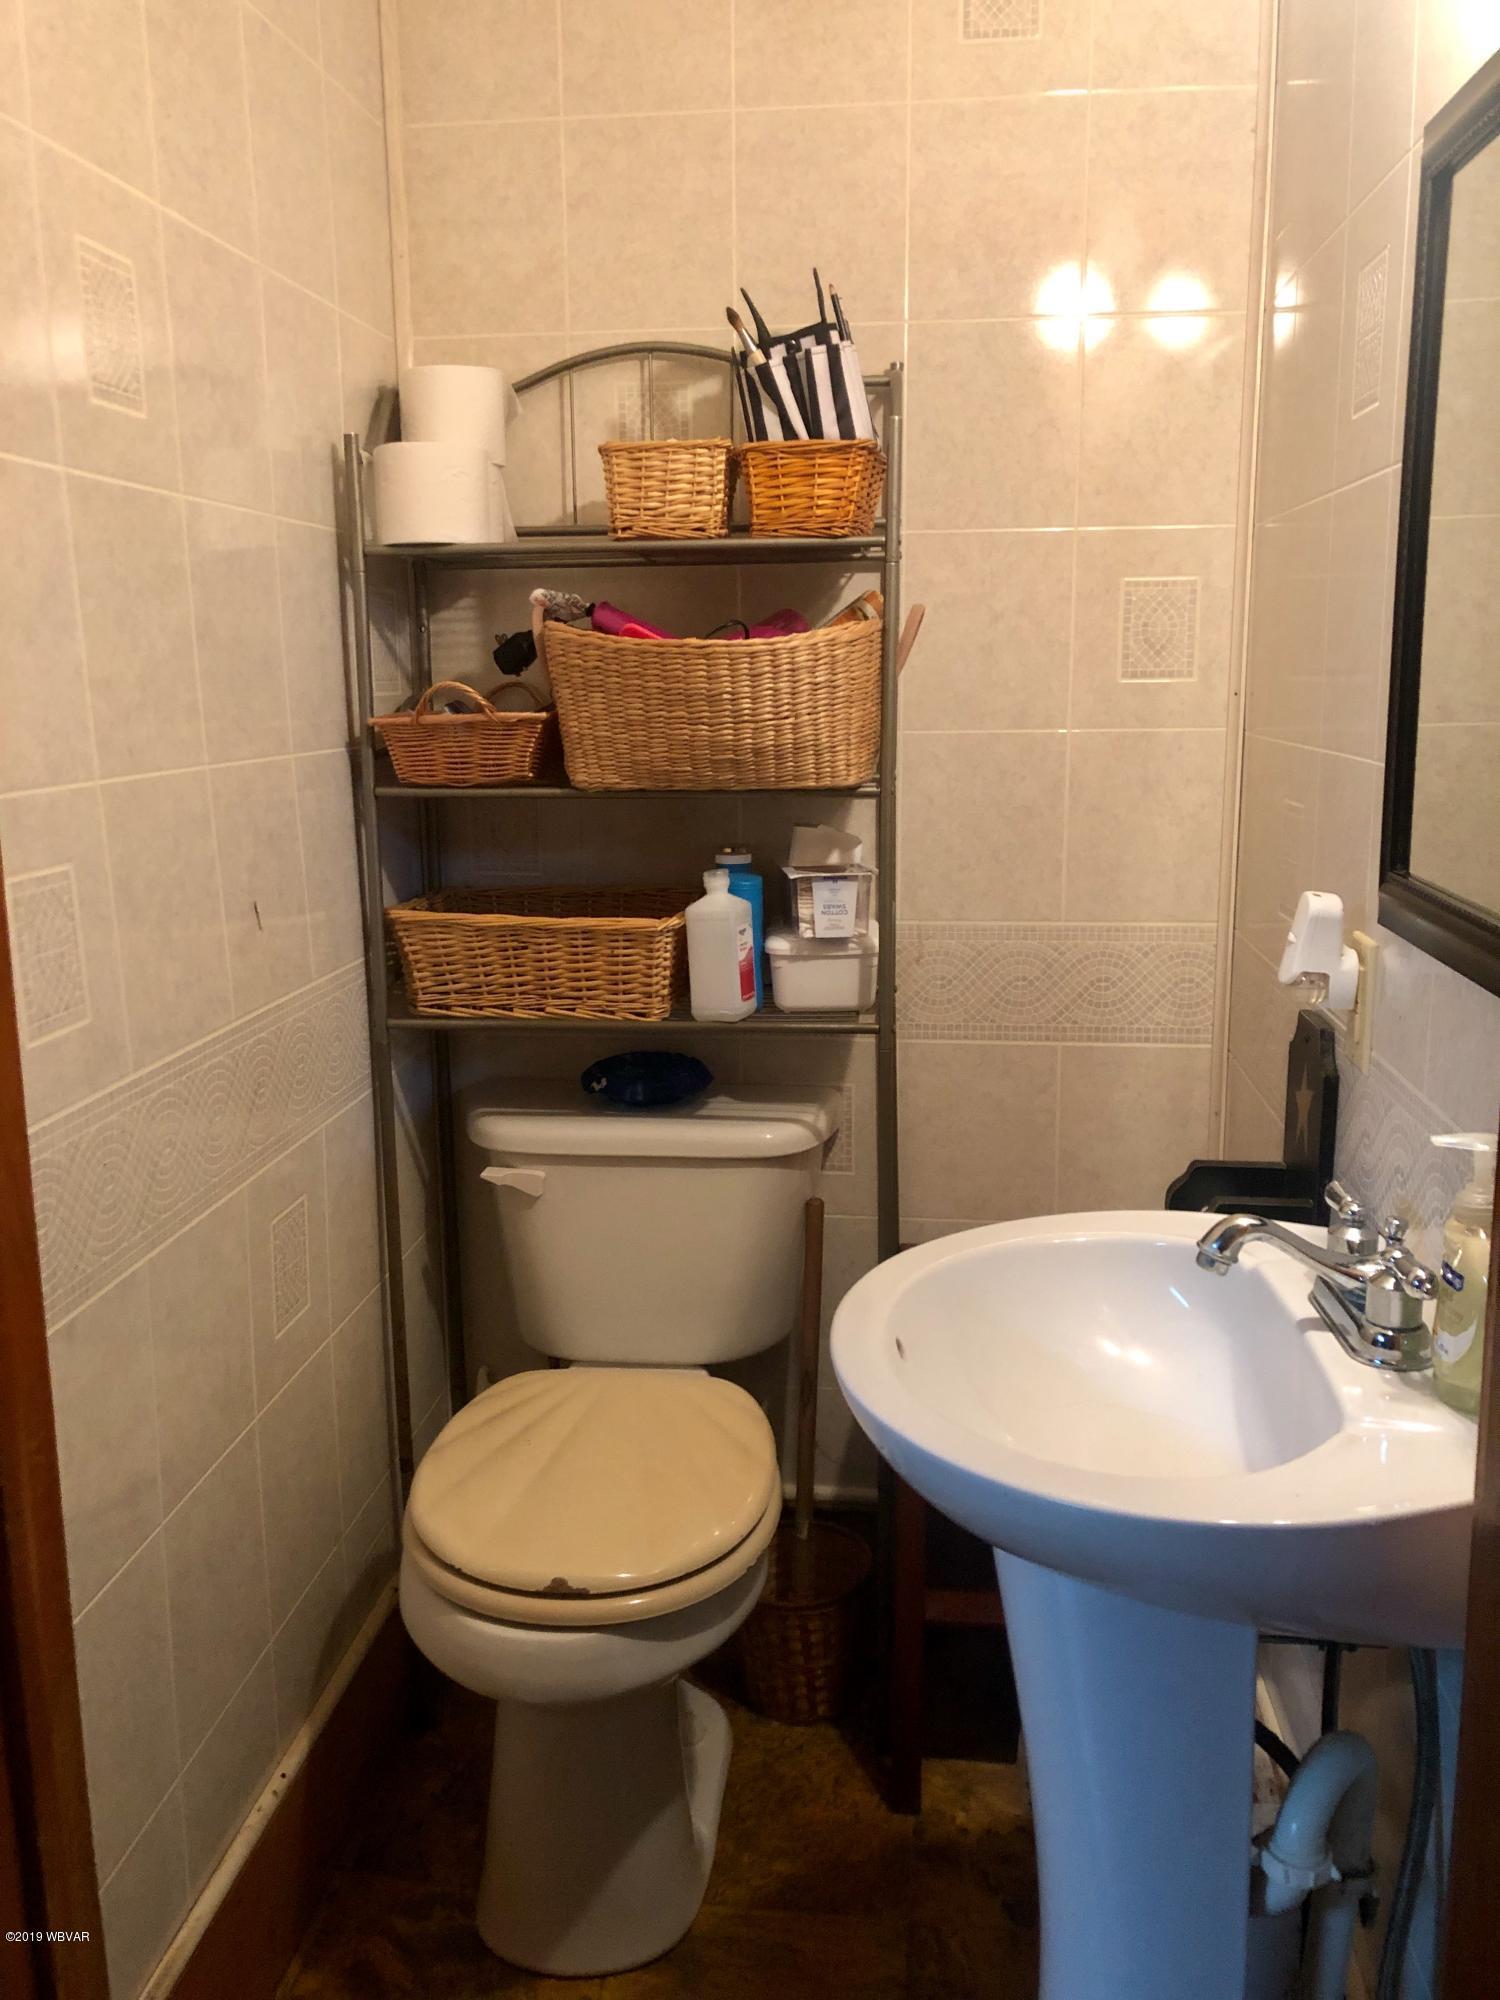 133 FISHING CREEK ROAD,Mill Hall,PA 17751,3 Bedrooms Bedrooms,2 BathroomsBathrooms,Residential,FISHING CREEK,WB-87311